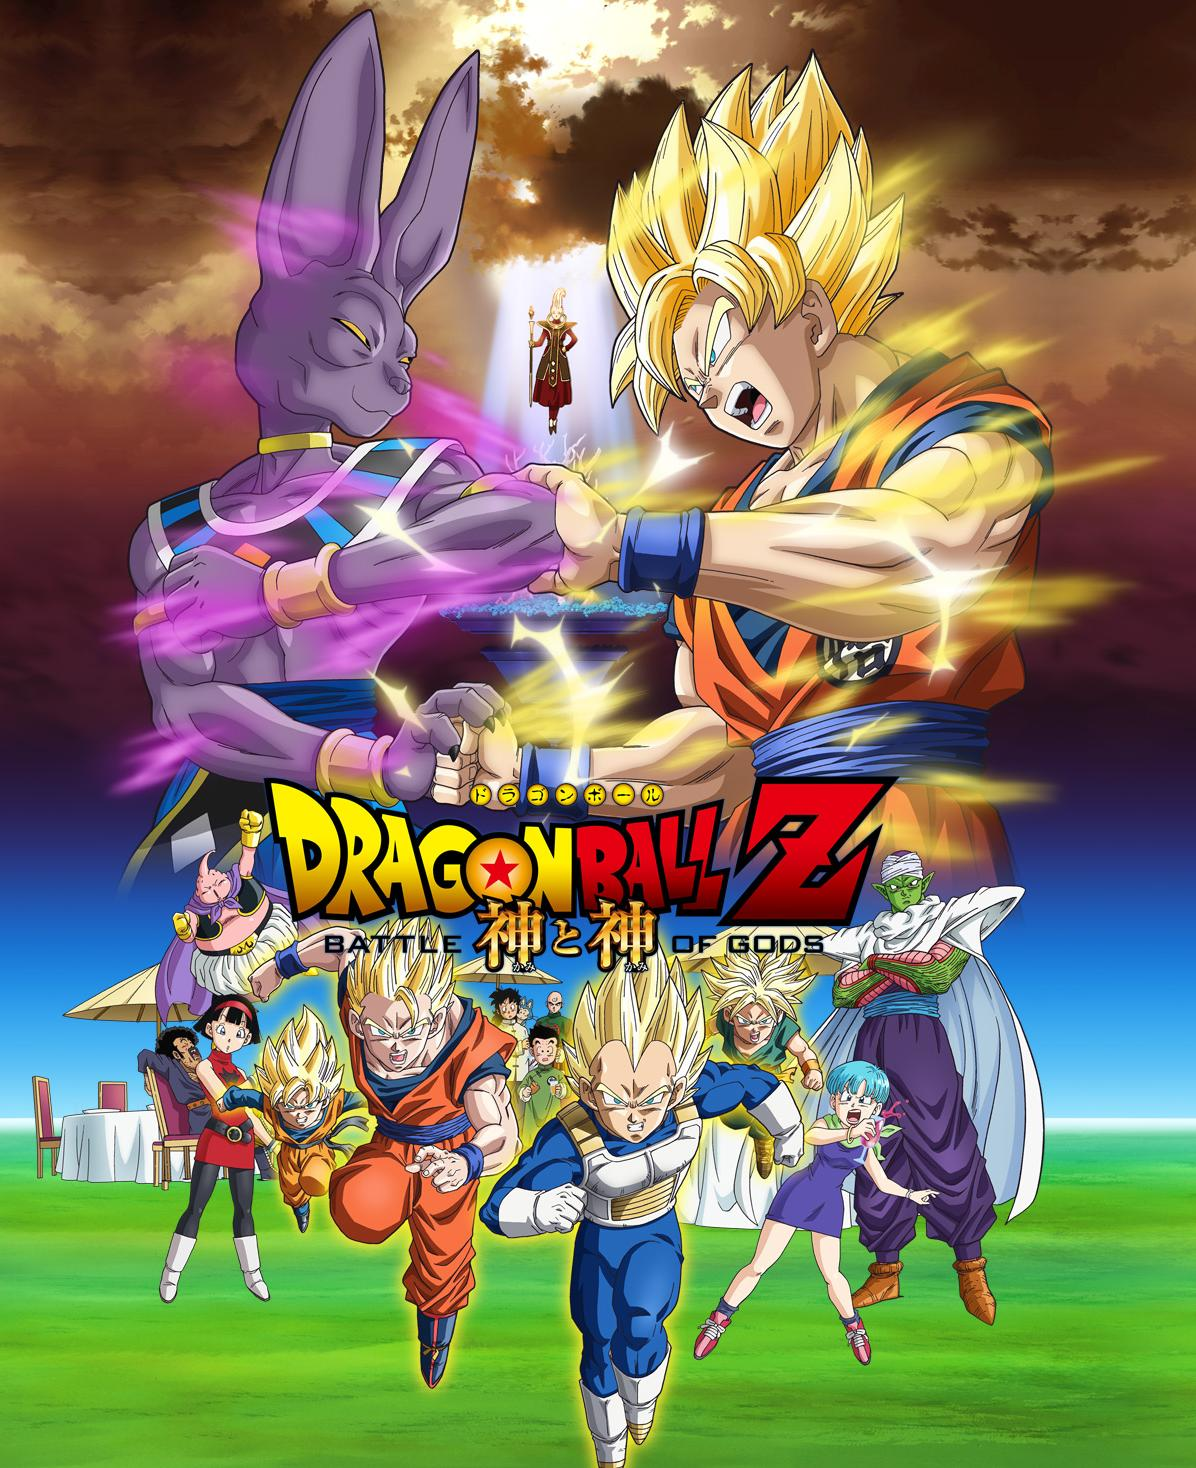 Peli de dragon ball Z BattleofGodsscan1